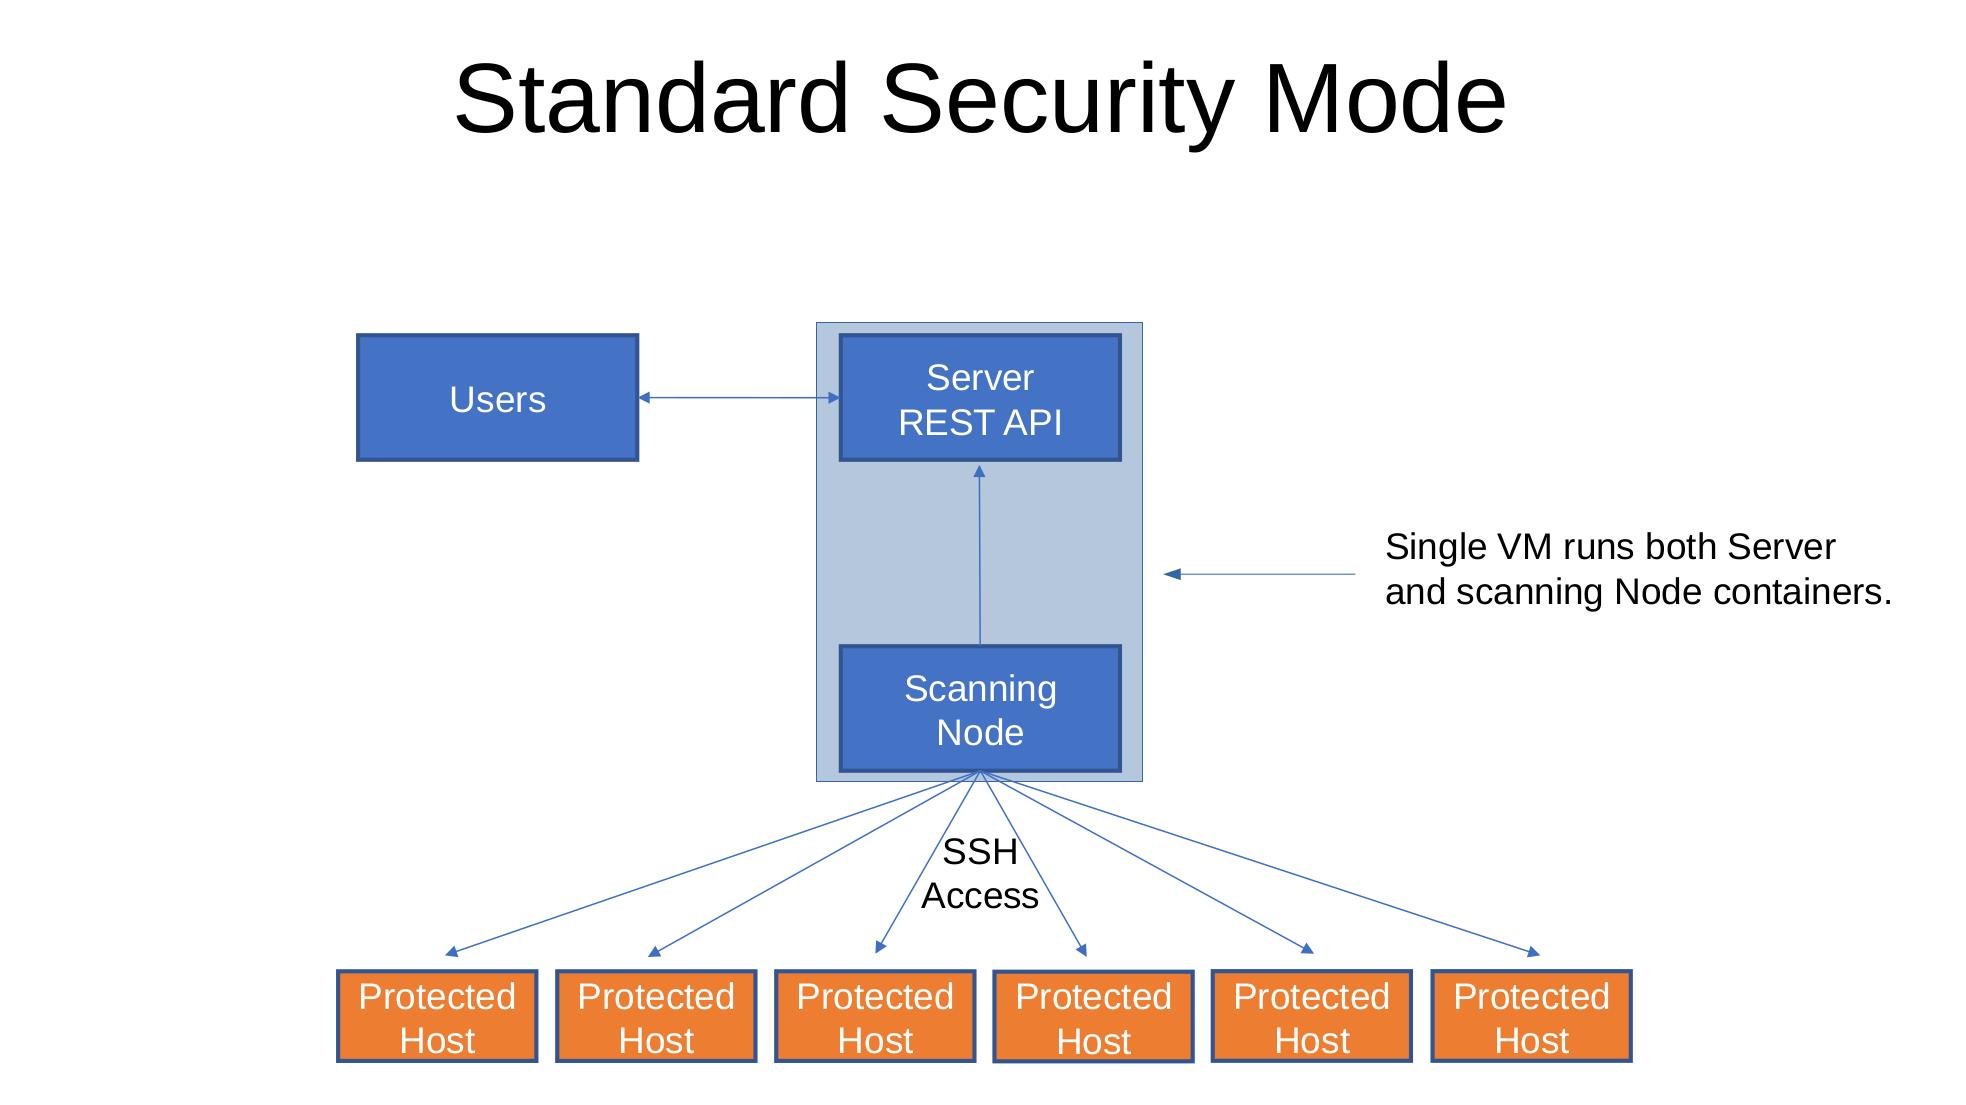 Standard Security Mode